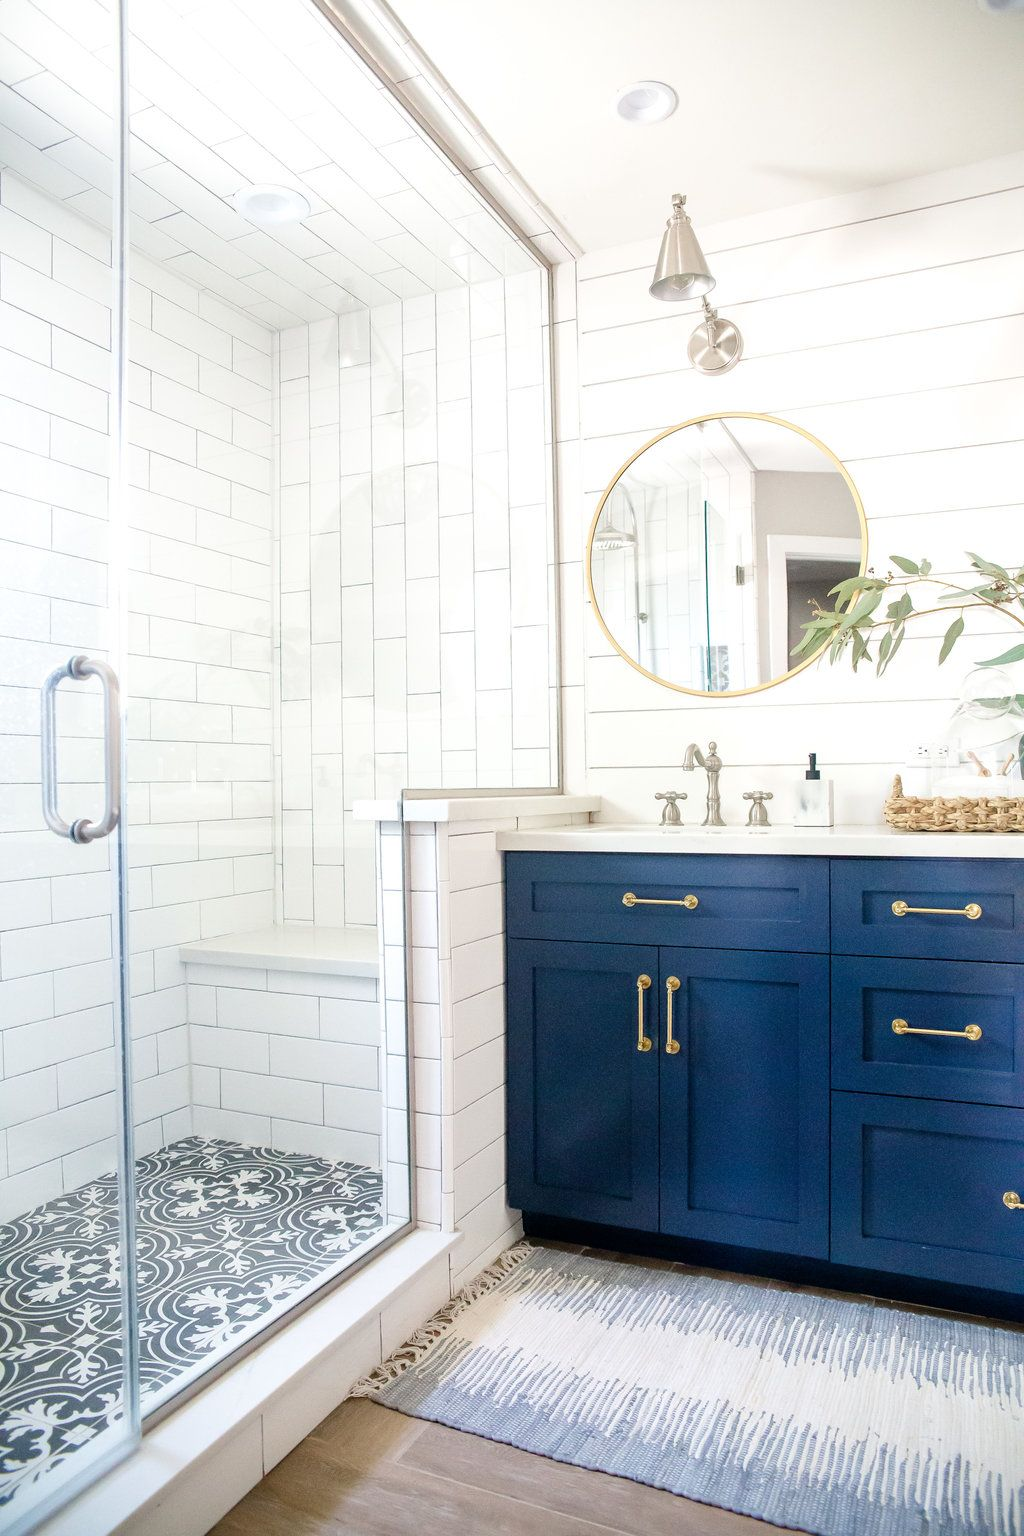 Casadeleeproject Bathroom Lead Design Lifestyledco Photos Natalieryanphotoaz Lif Cottage Bathroom Decor Bathroom Trends White Subway Tile Shower